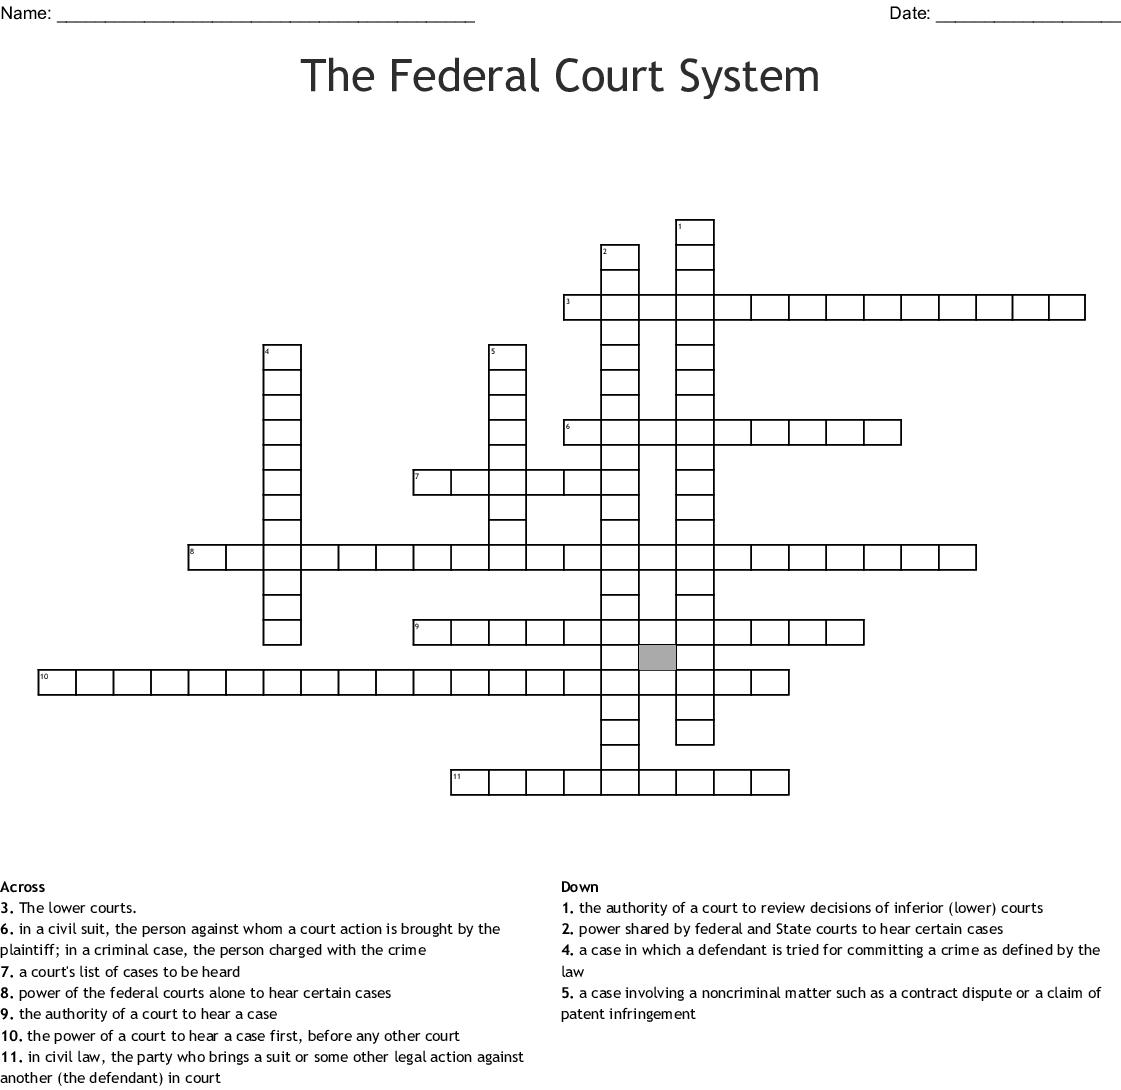 Supreme Court Vocabulary Crossword Puzzle - WordMint